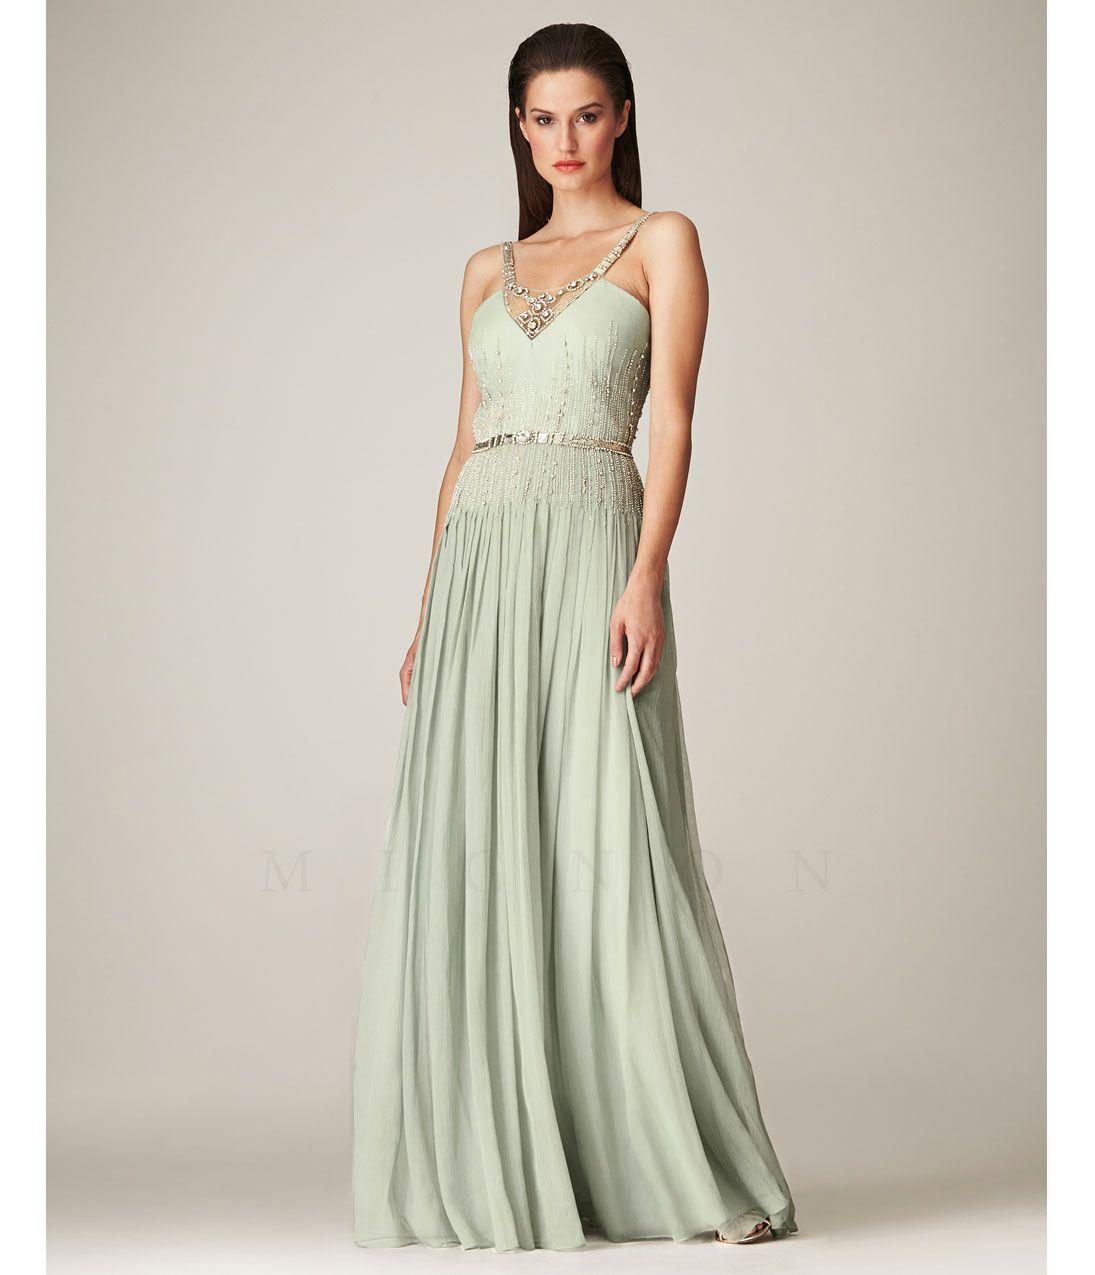 Grecian Prom Dresses 2015